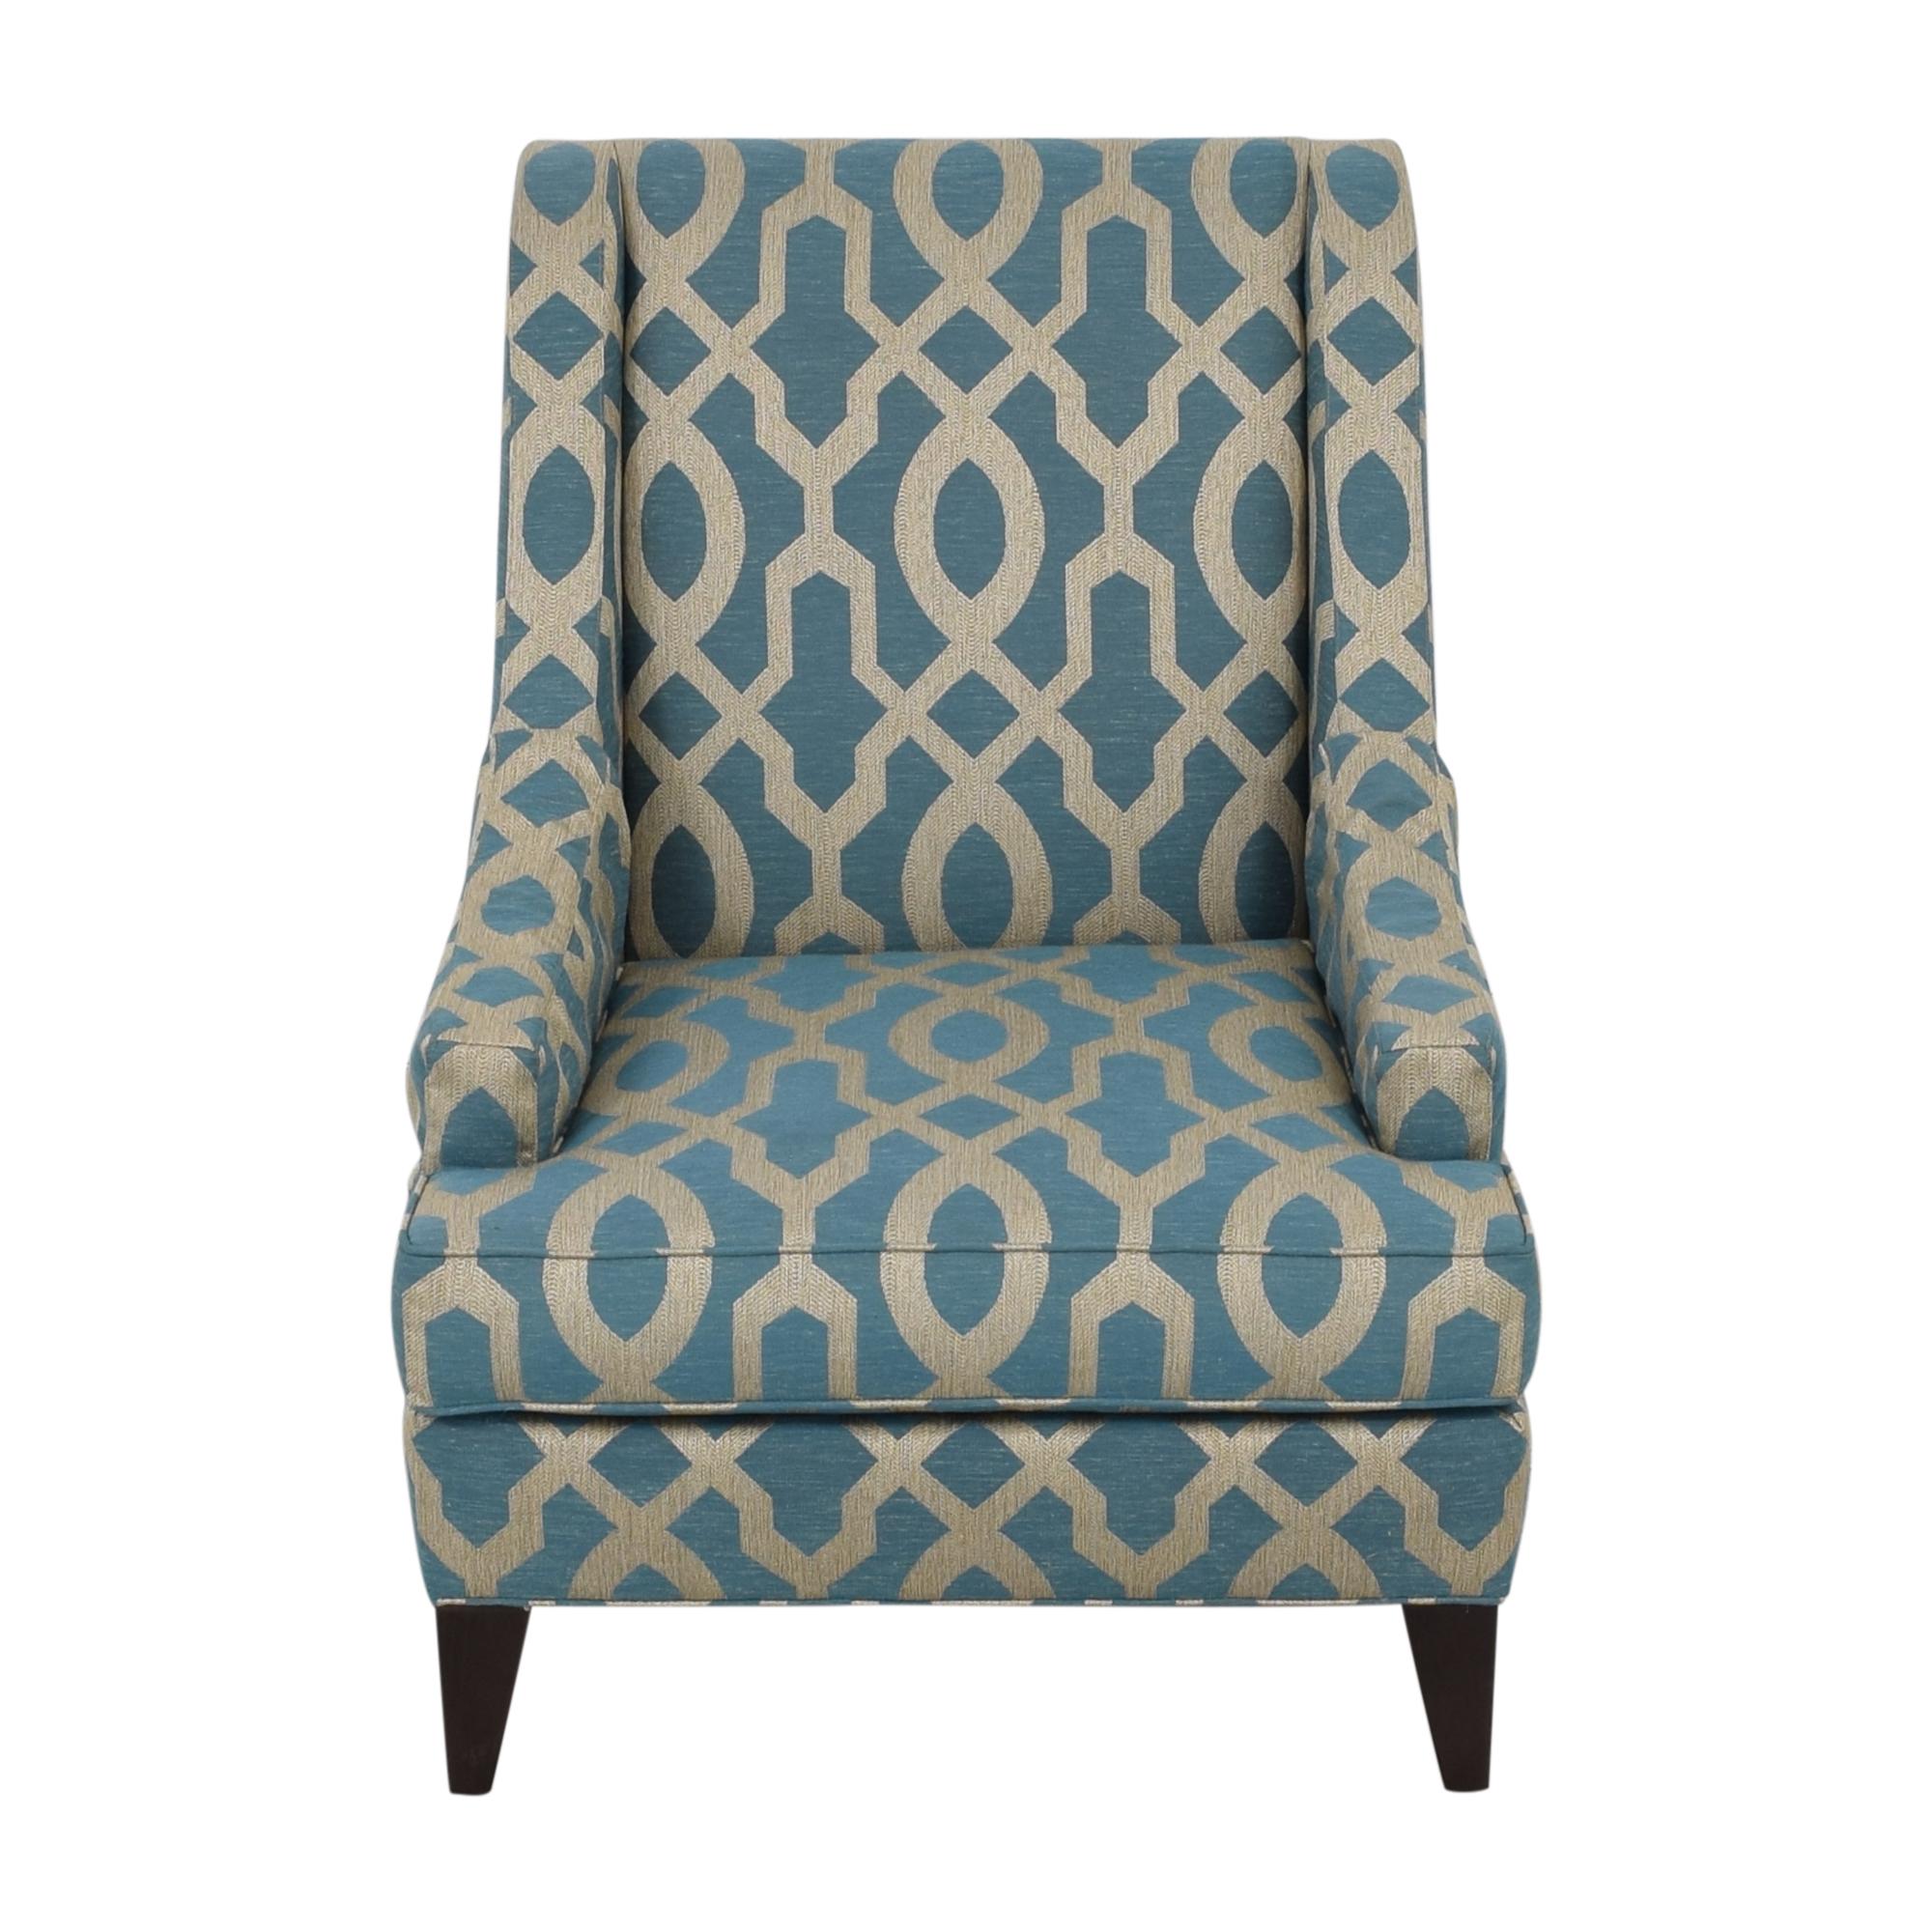 shop Ethan Allen Emerson Chair and Ottoman Ethan Allen Accent Chairs